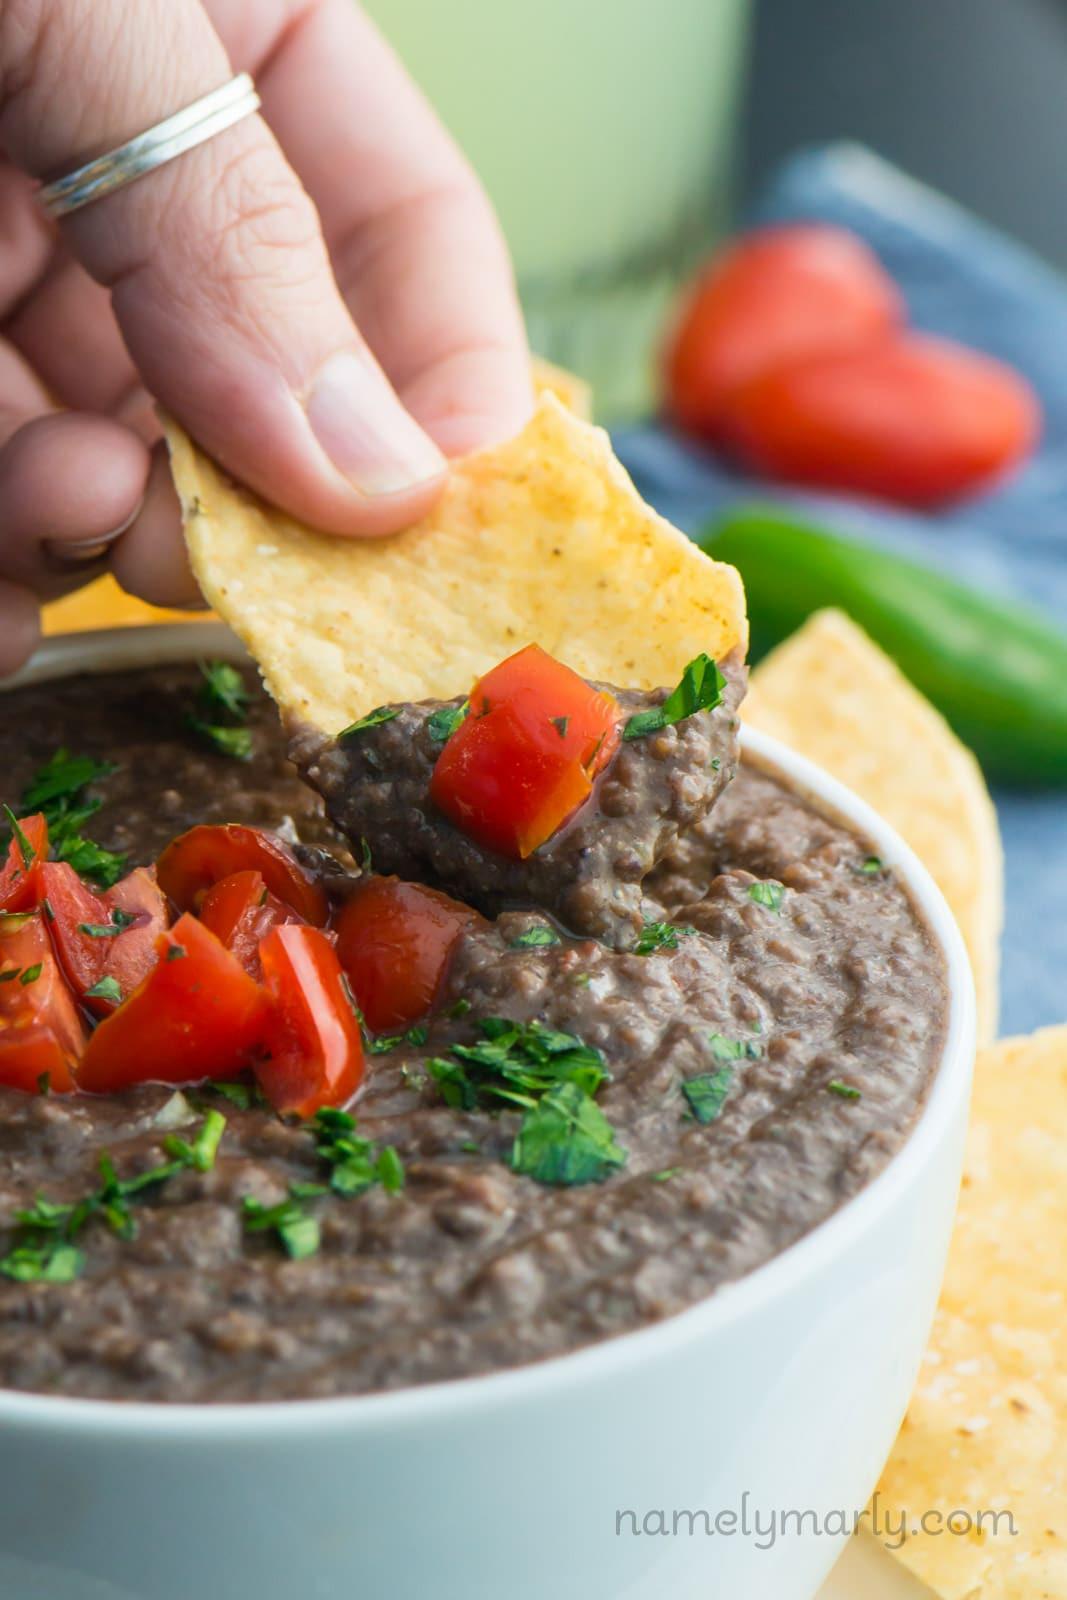 Vegan Bean Dip Recipes  Fresh and Easy Black Bean Dip Recipe Namely Marly